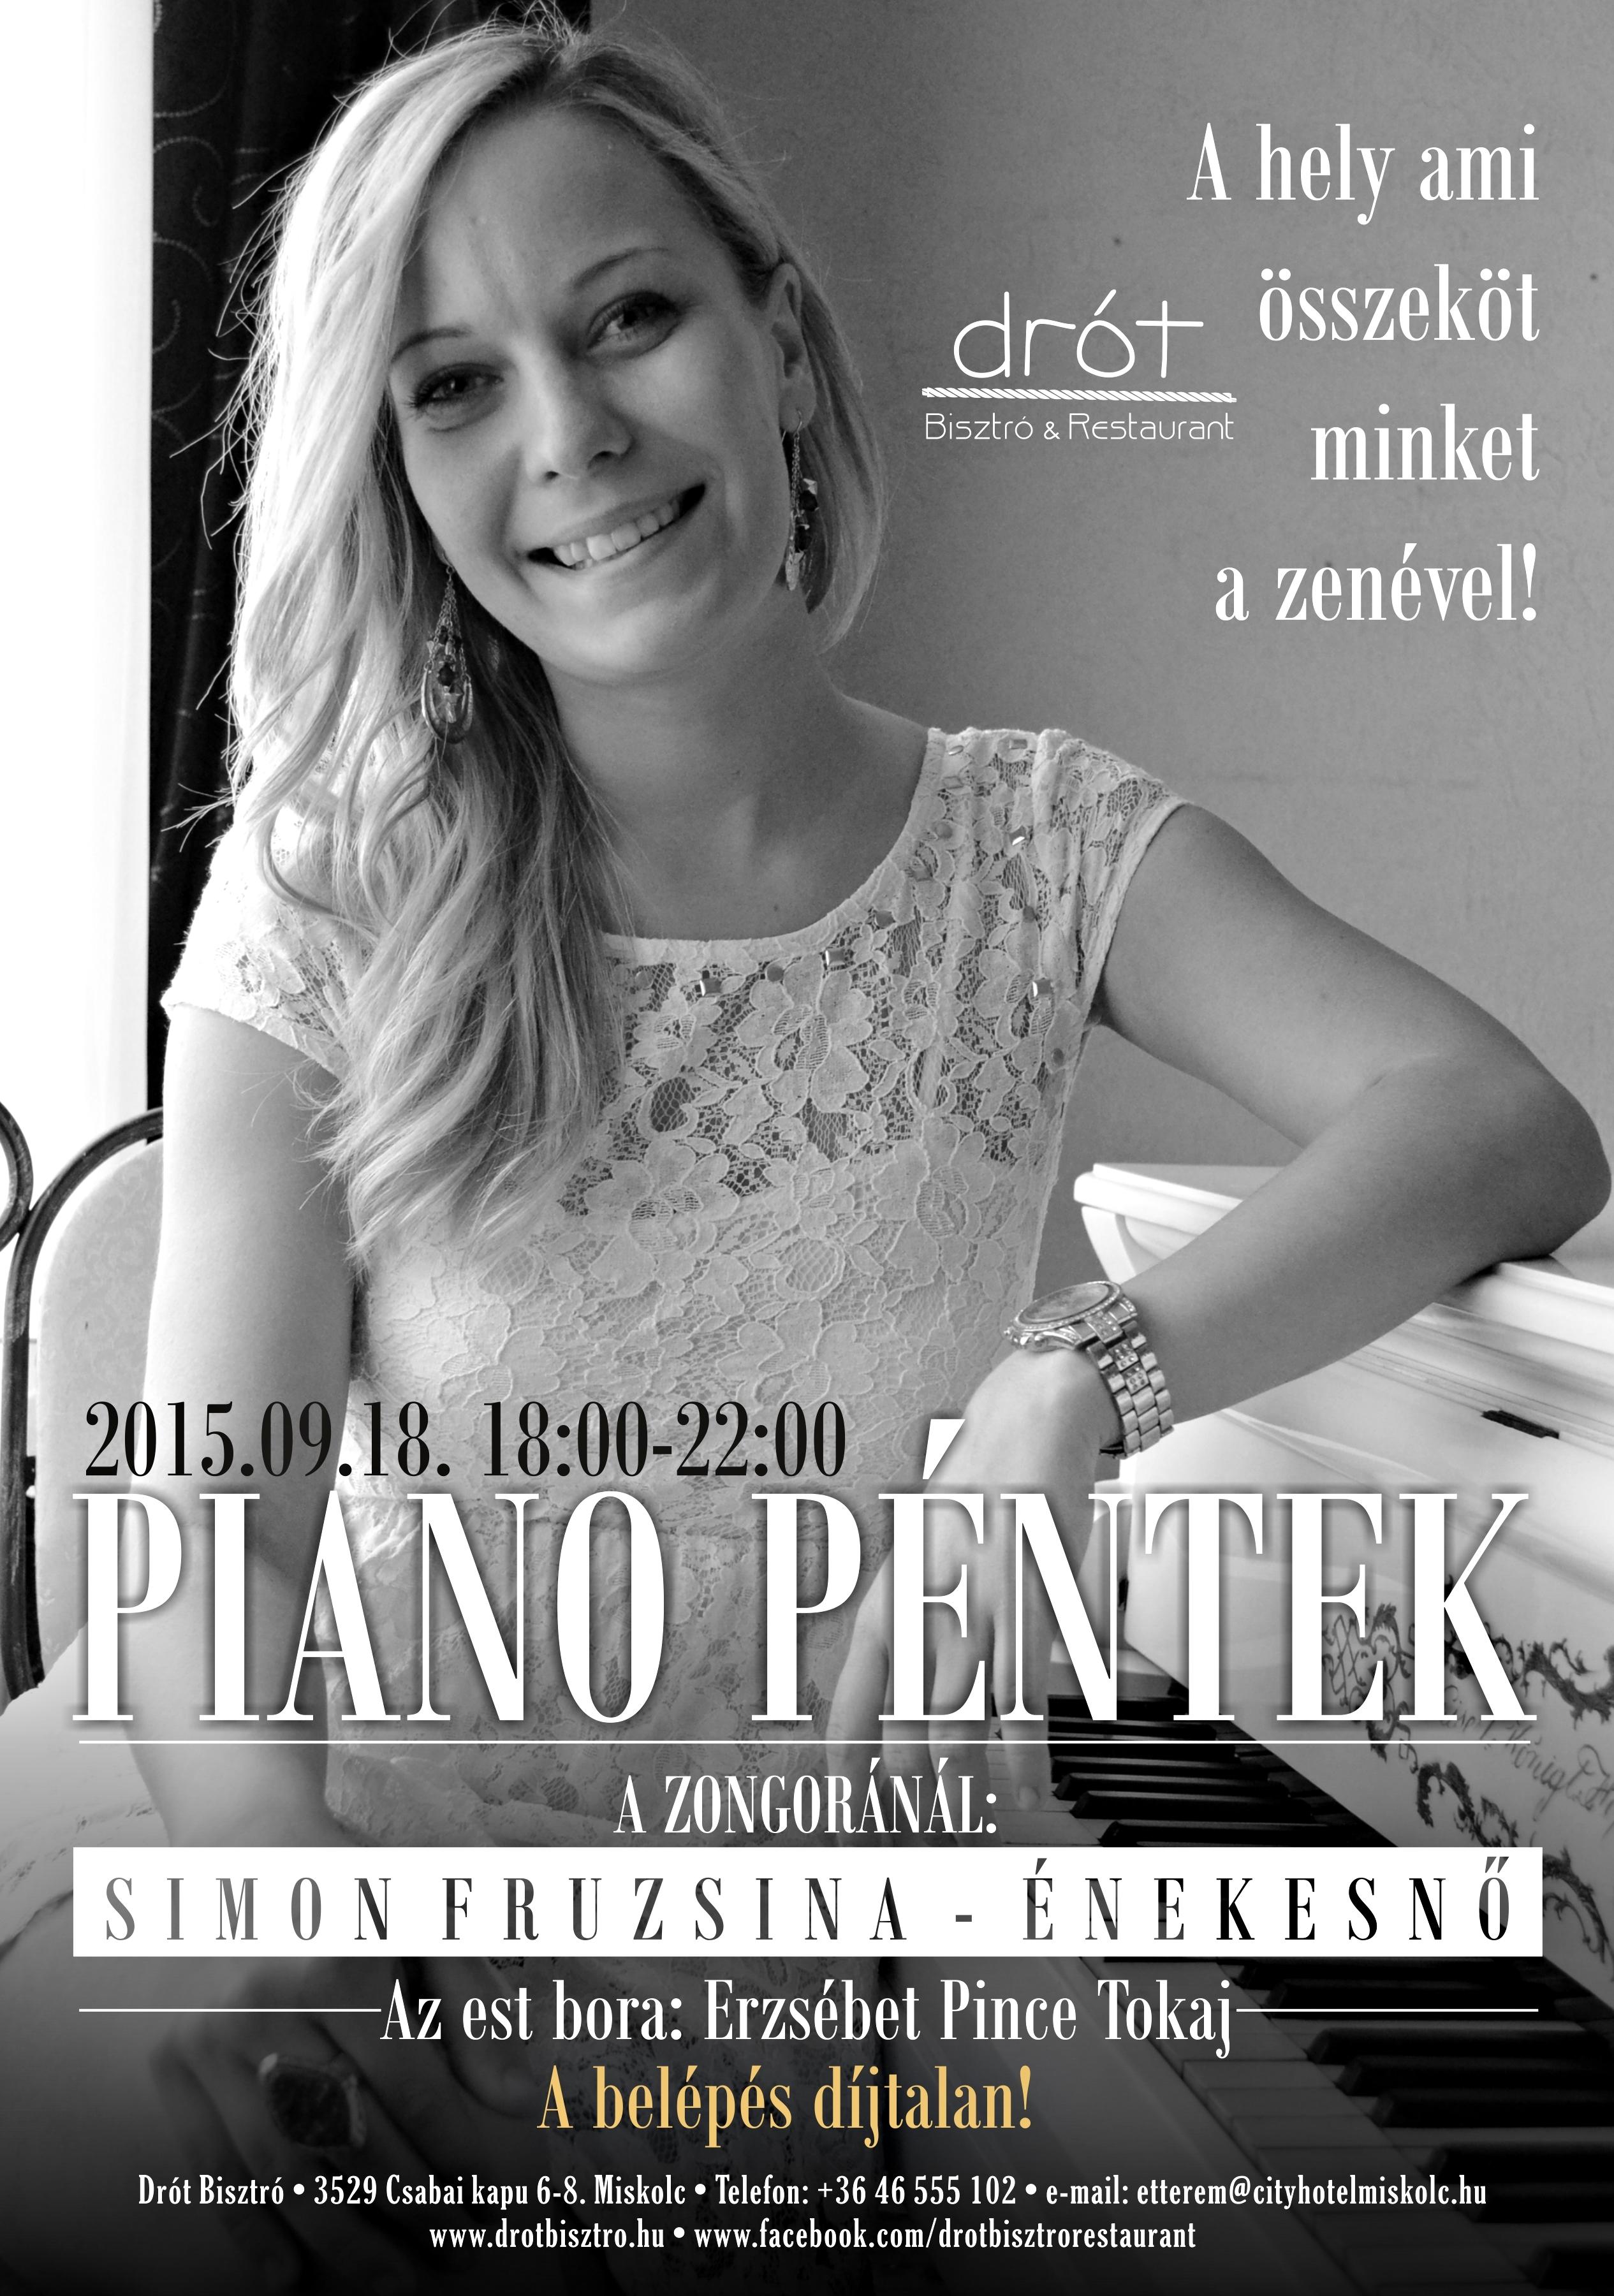 pianopentek_jó